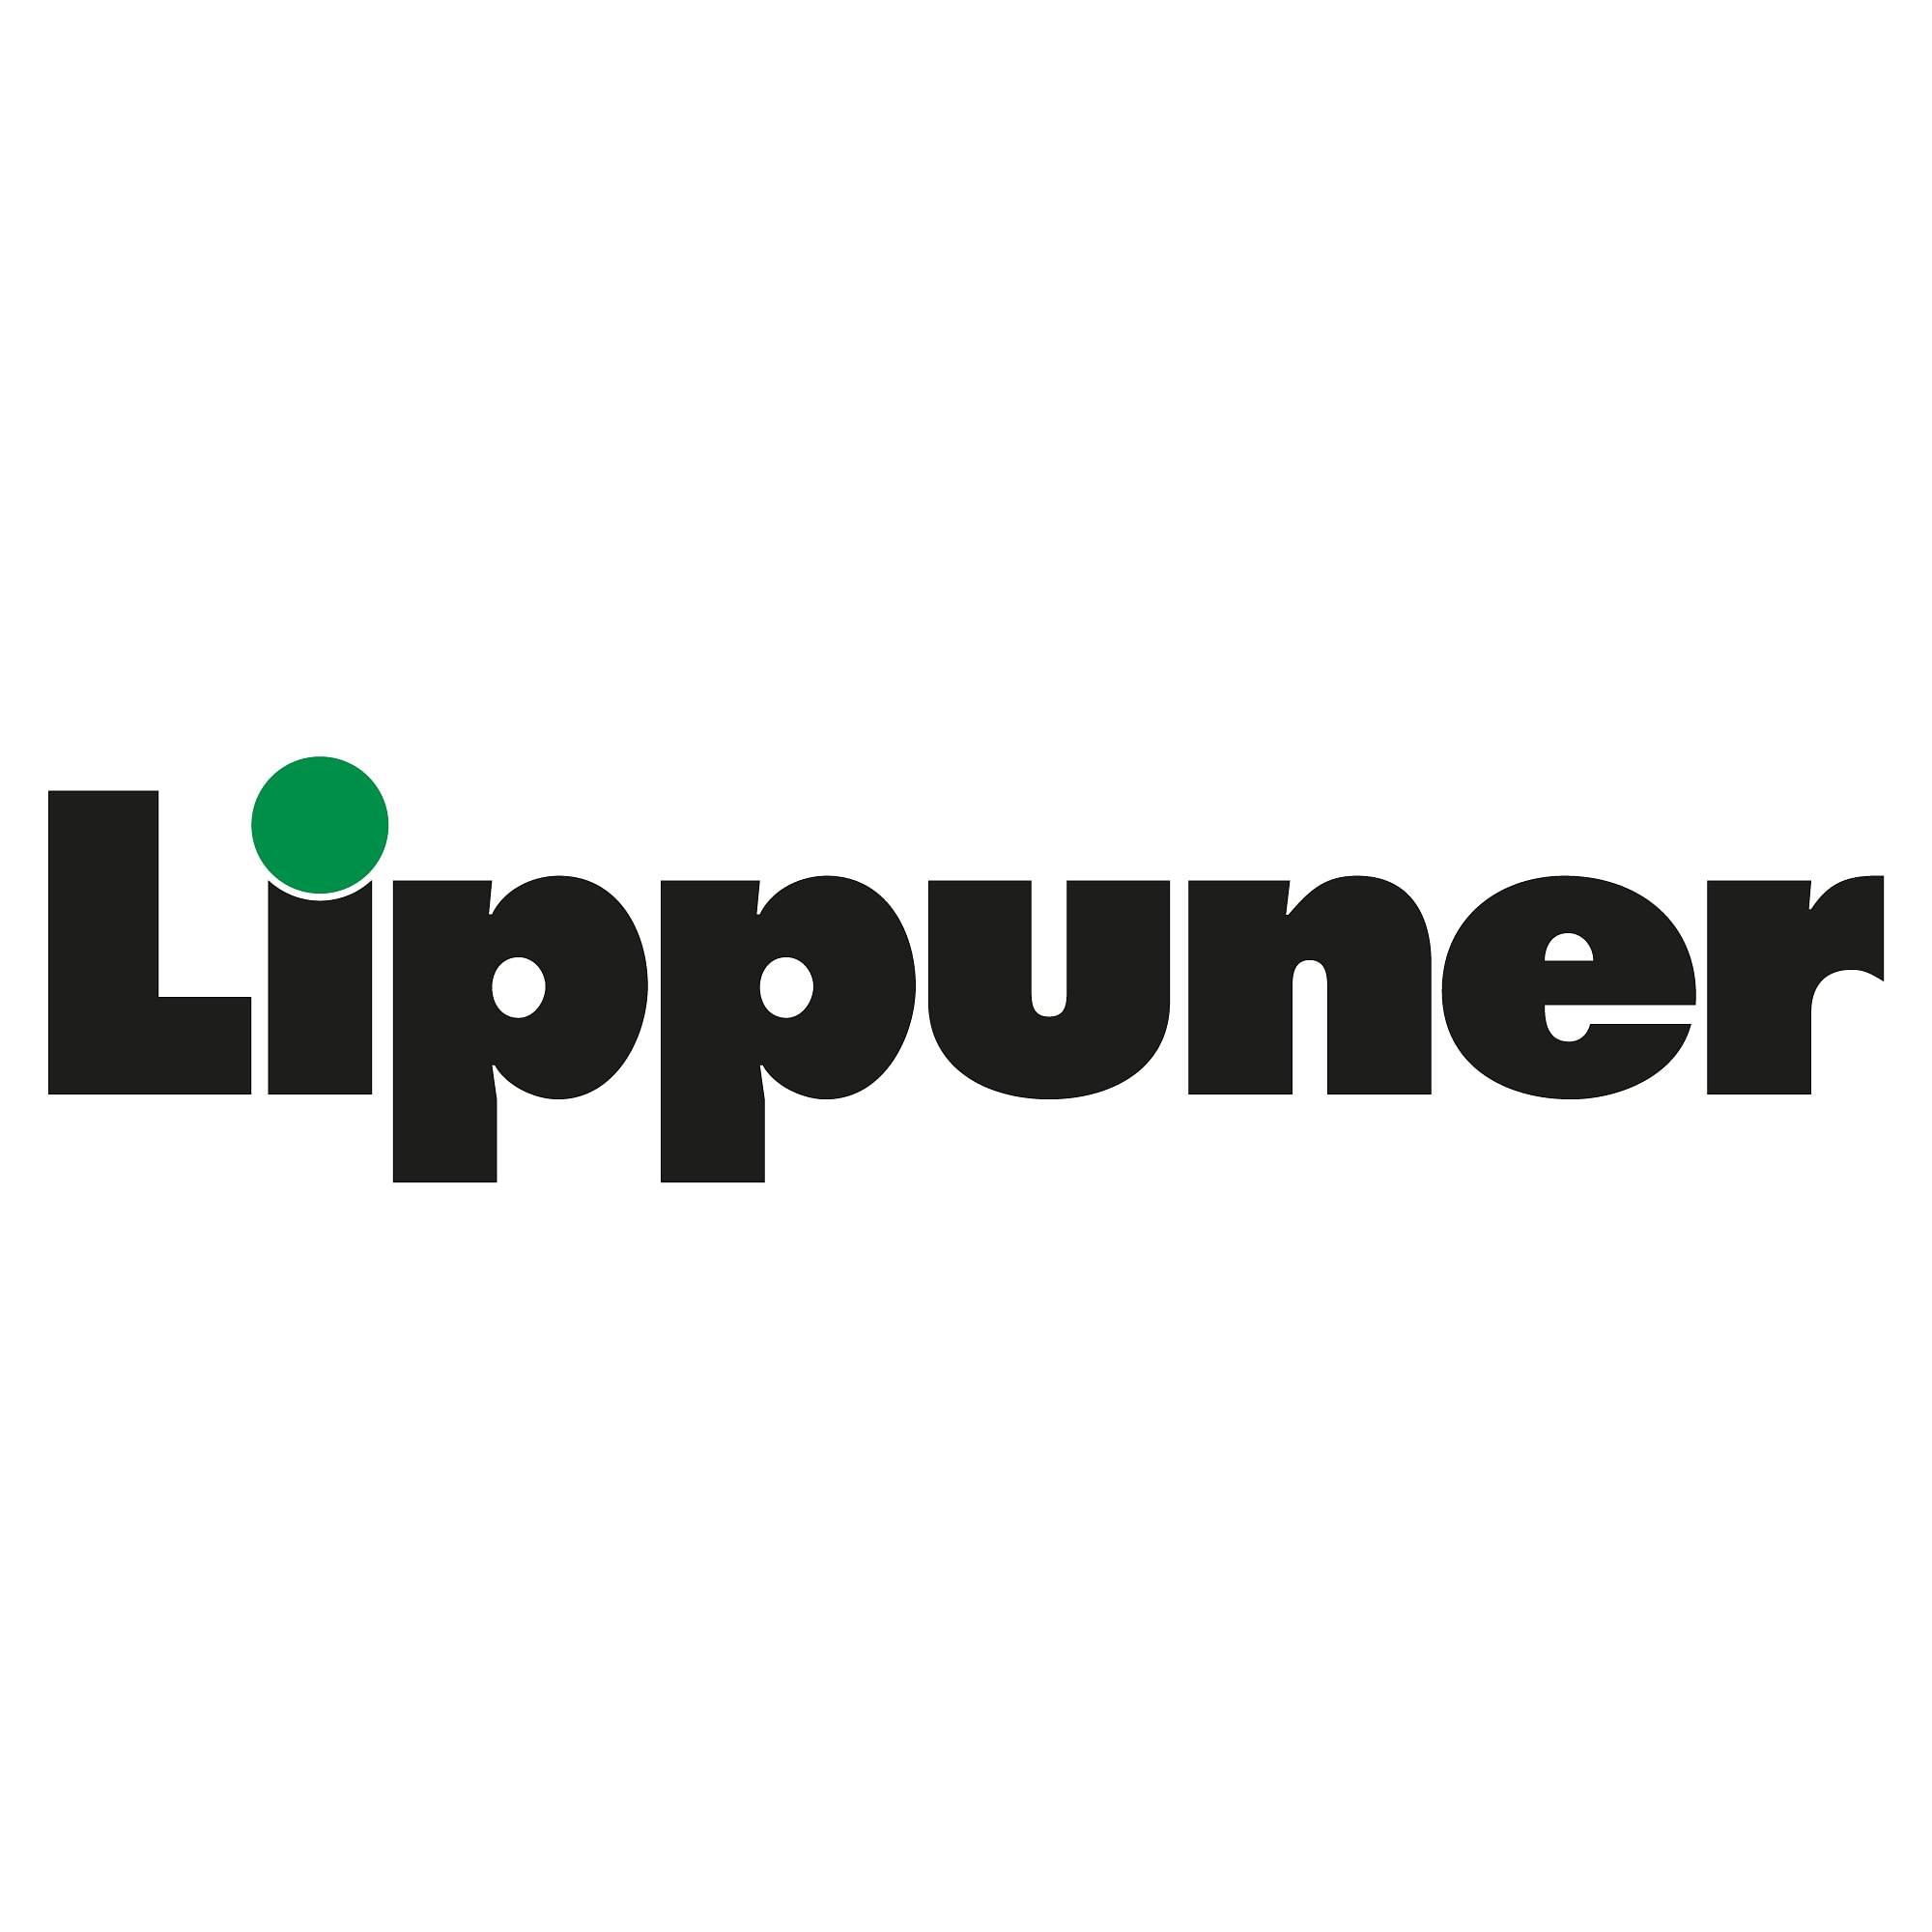 Lippuner Energie- und Metallbautechnik AG